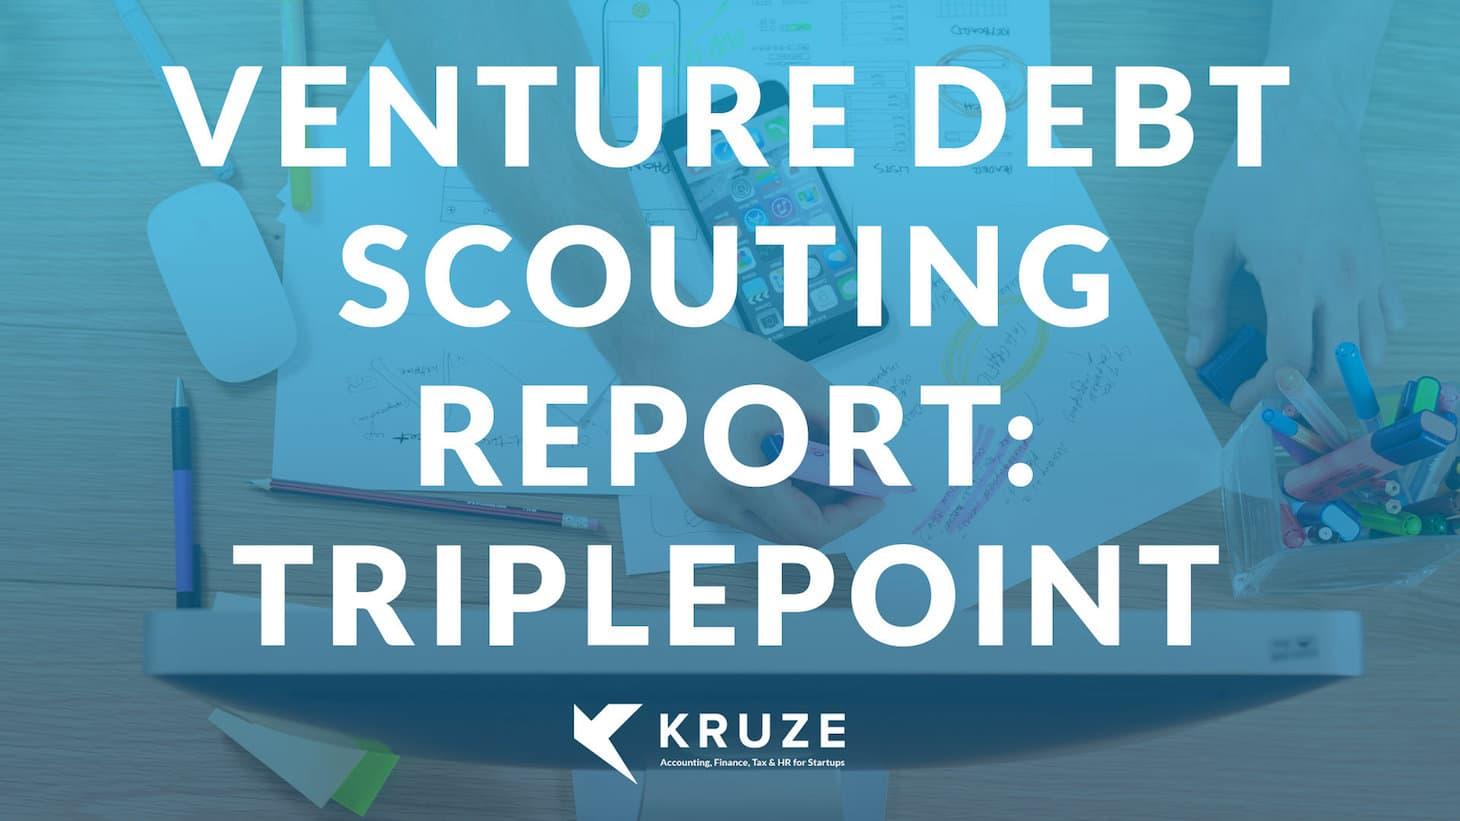 Venture Debt Scouting Report: Triplepoint